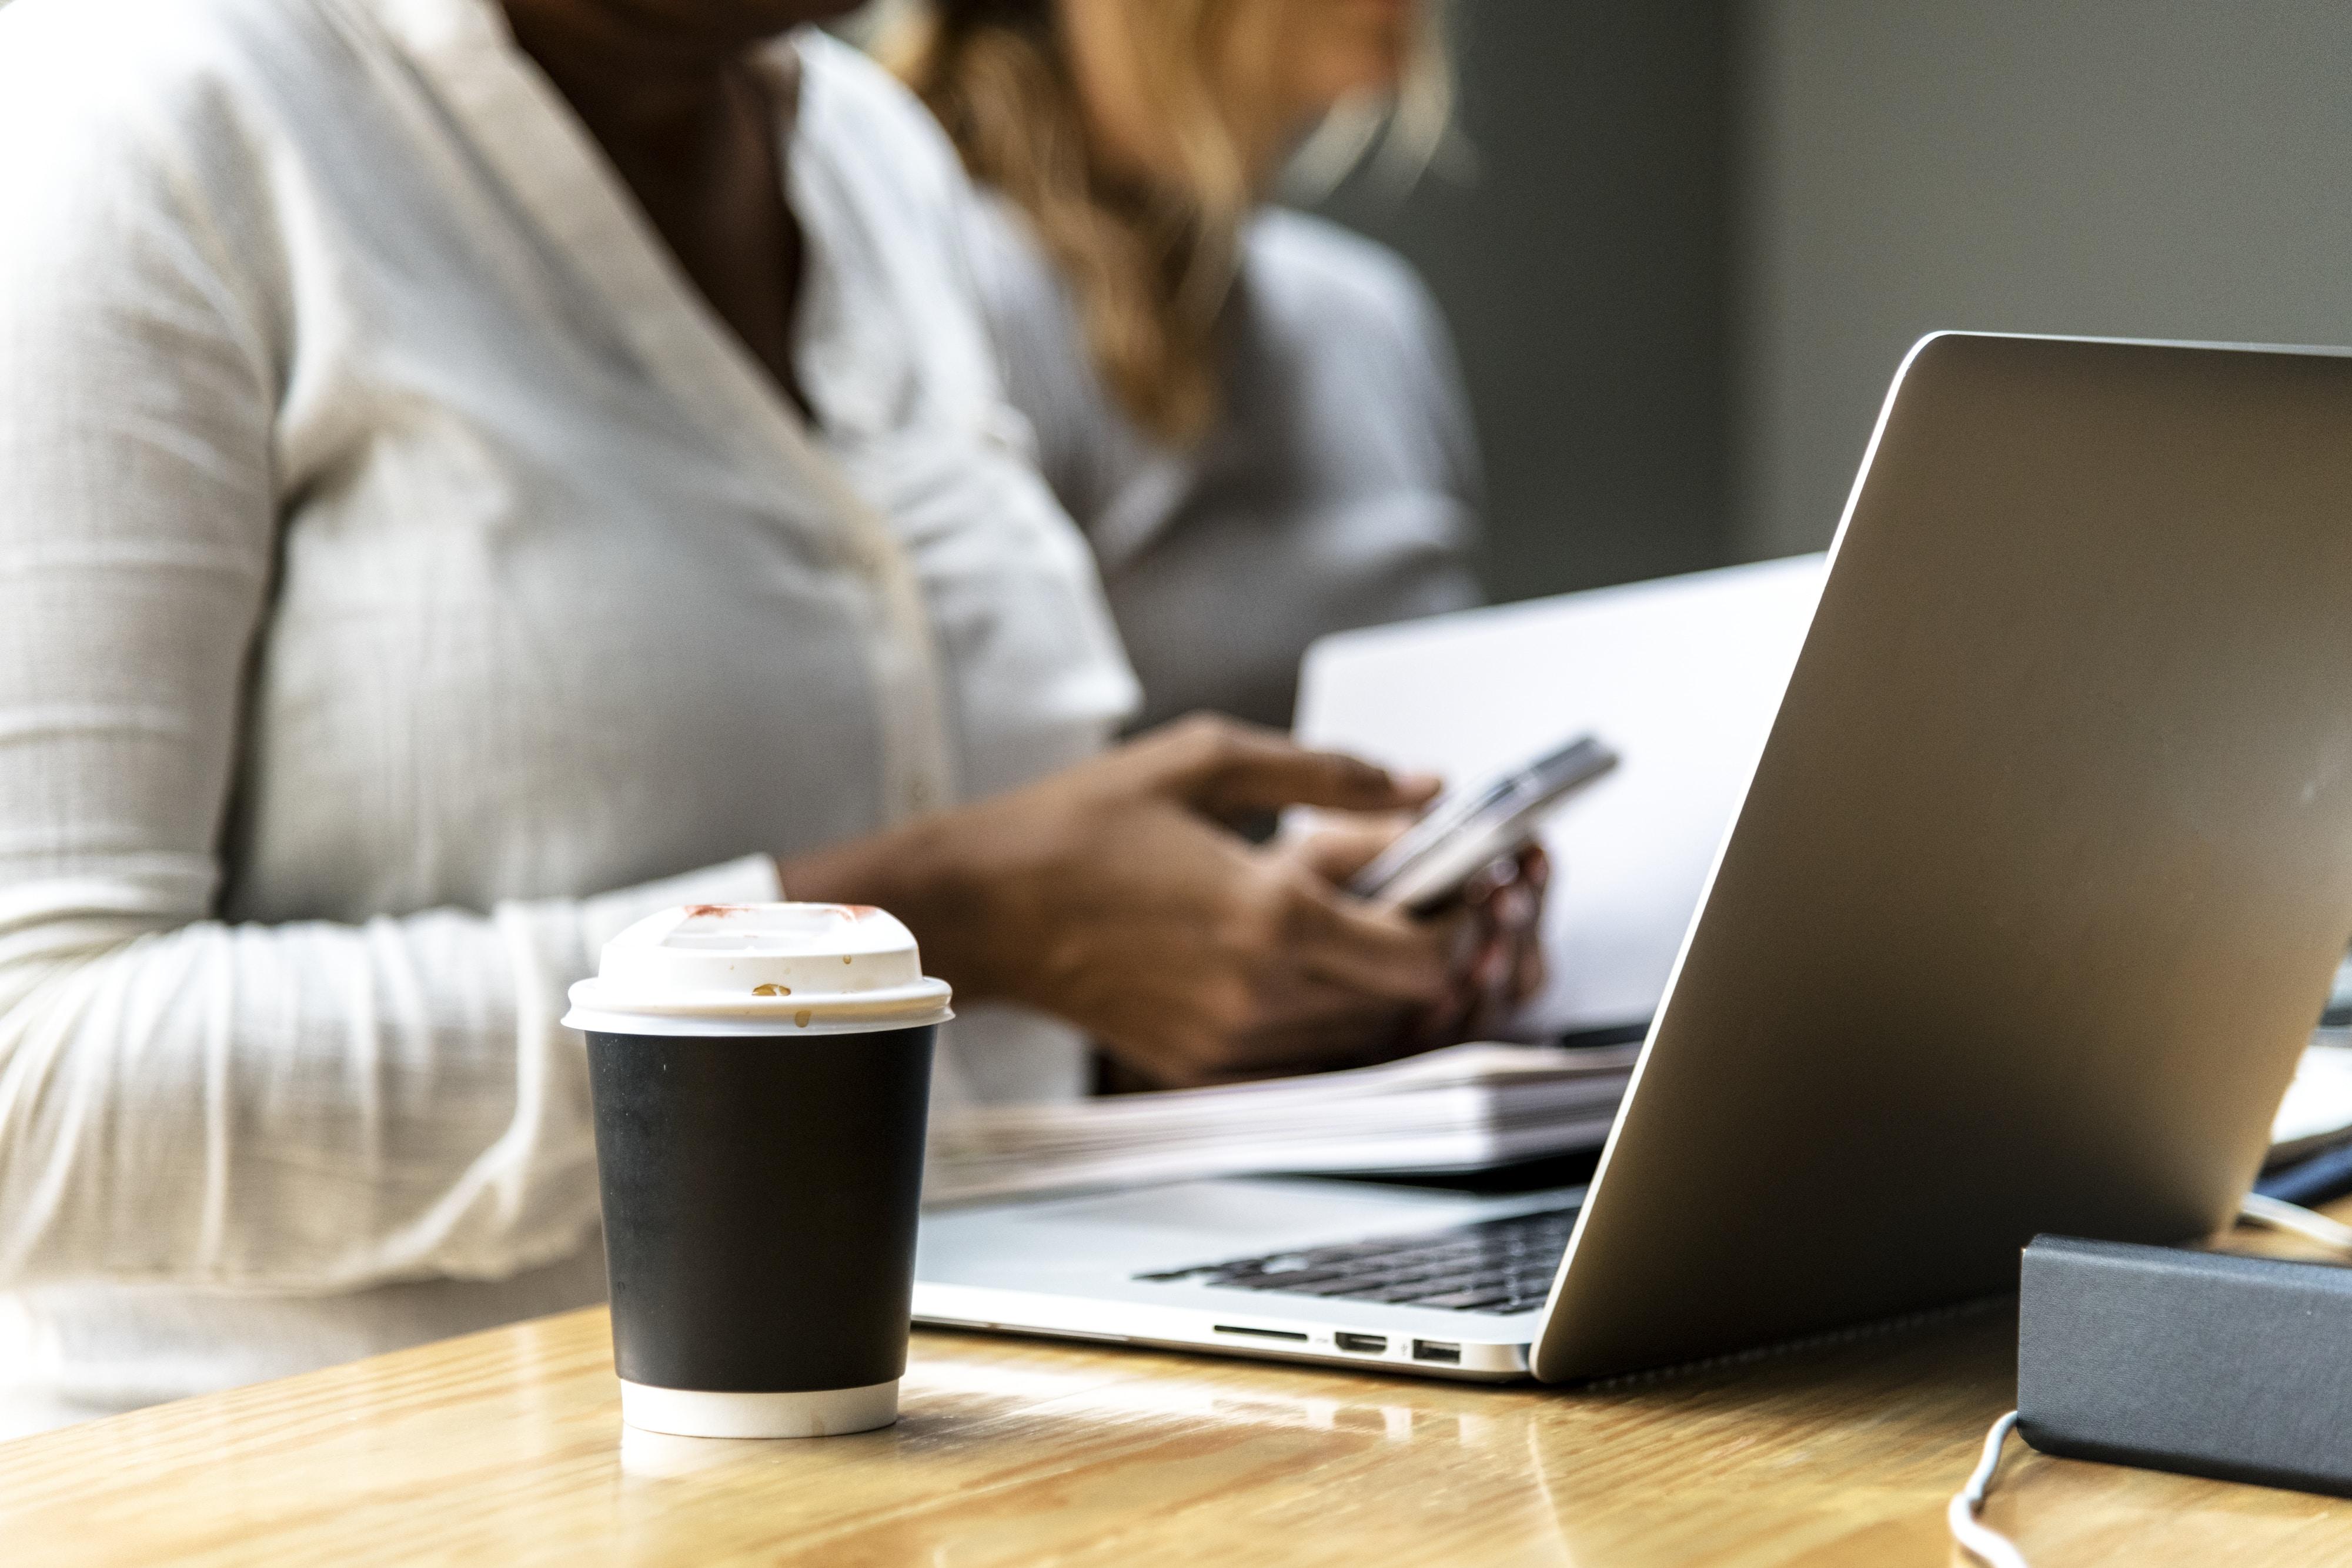 coffee cup beside laptop